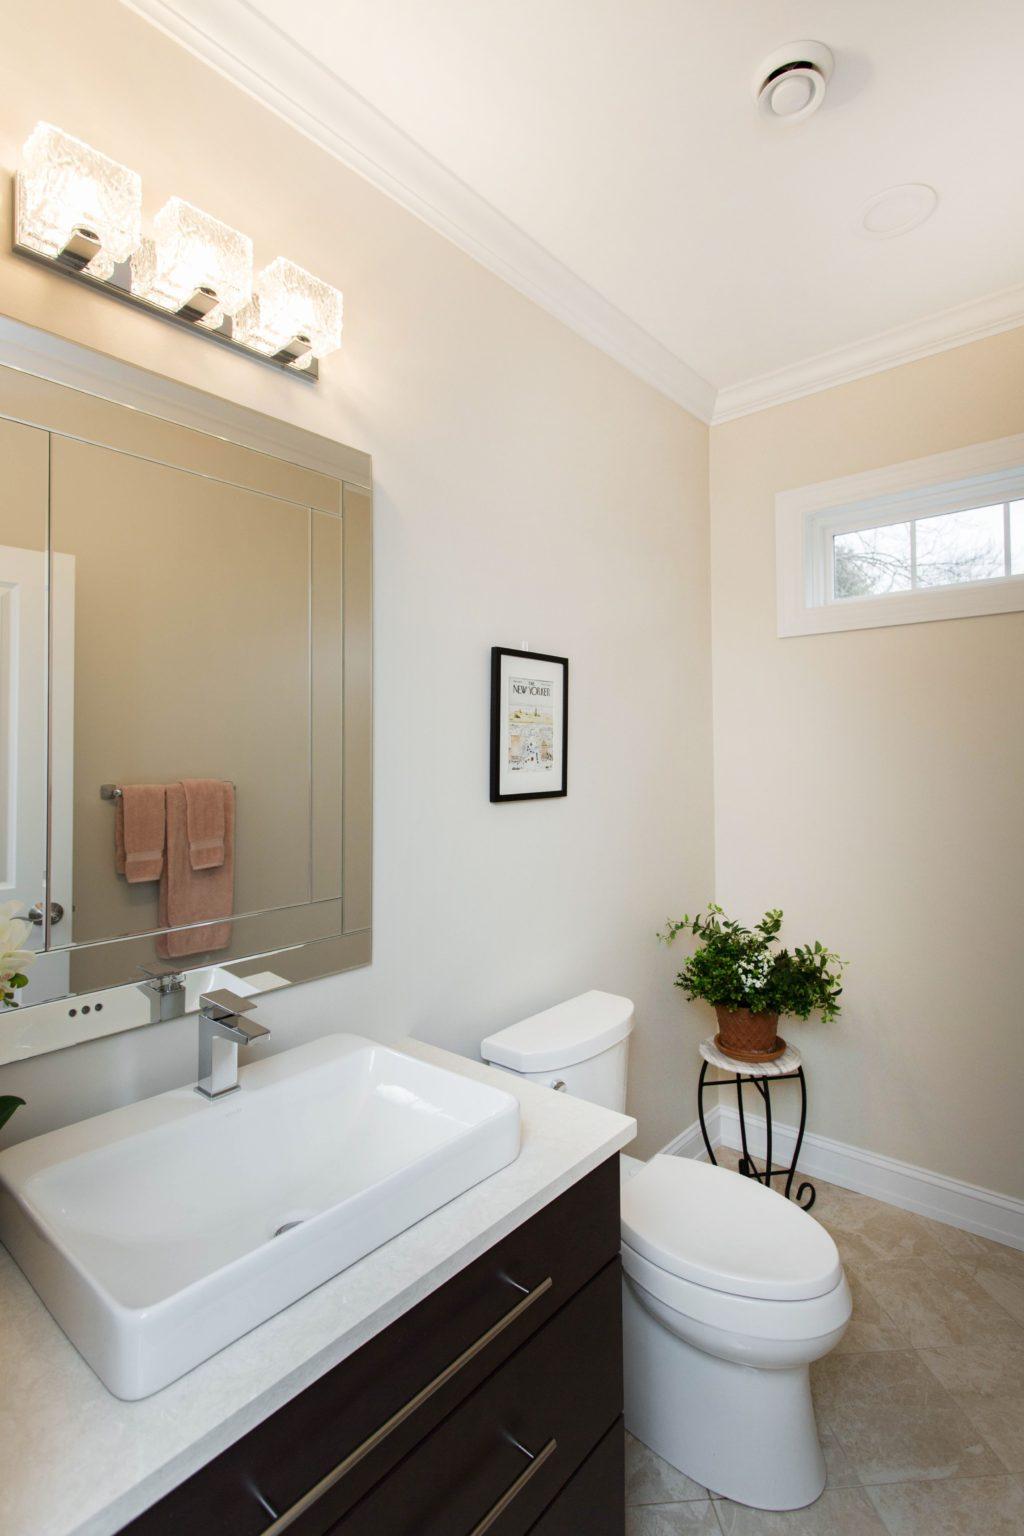 Bathroom Remodel Ideas And Samples Saratoga Ny